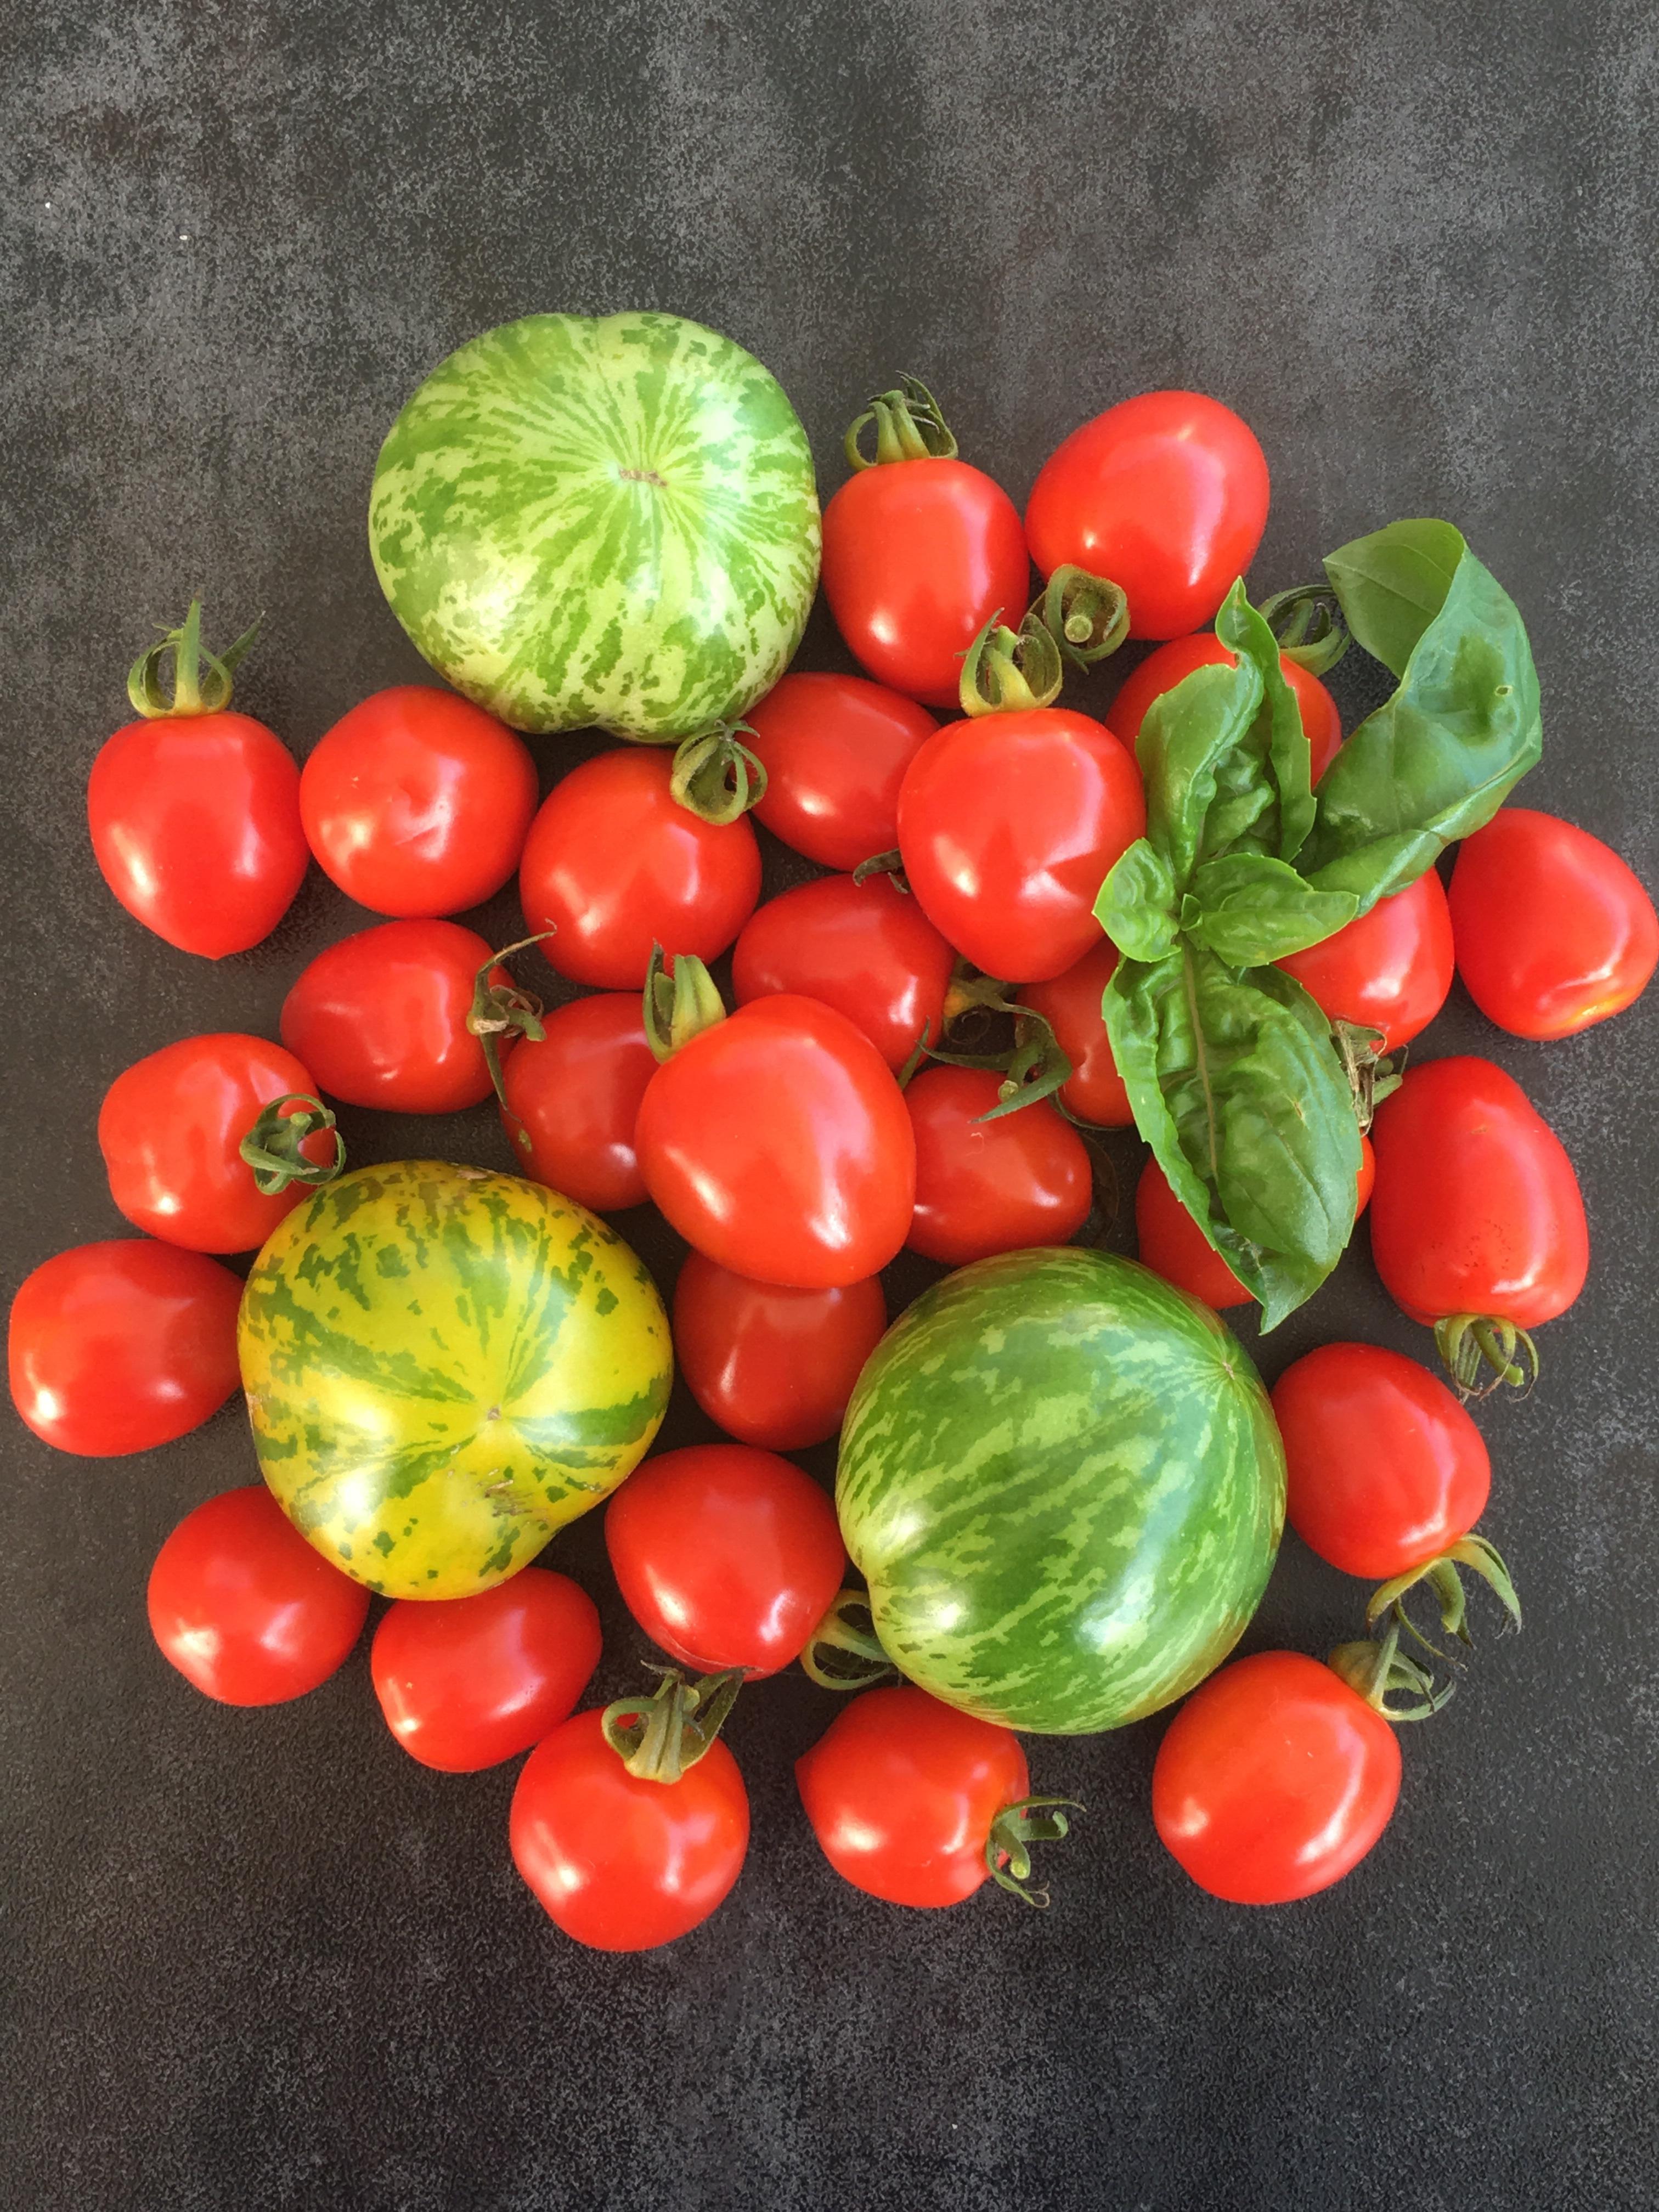 Tomates de mon jardin - Delimoon.com